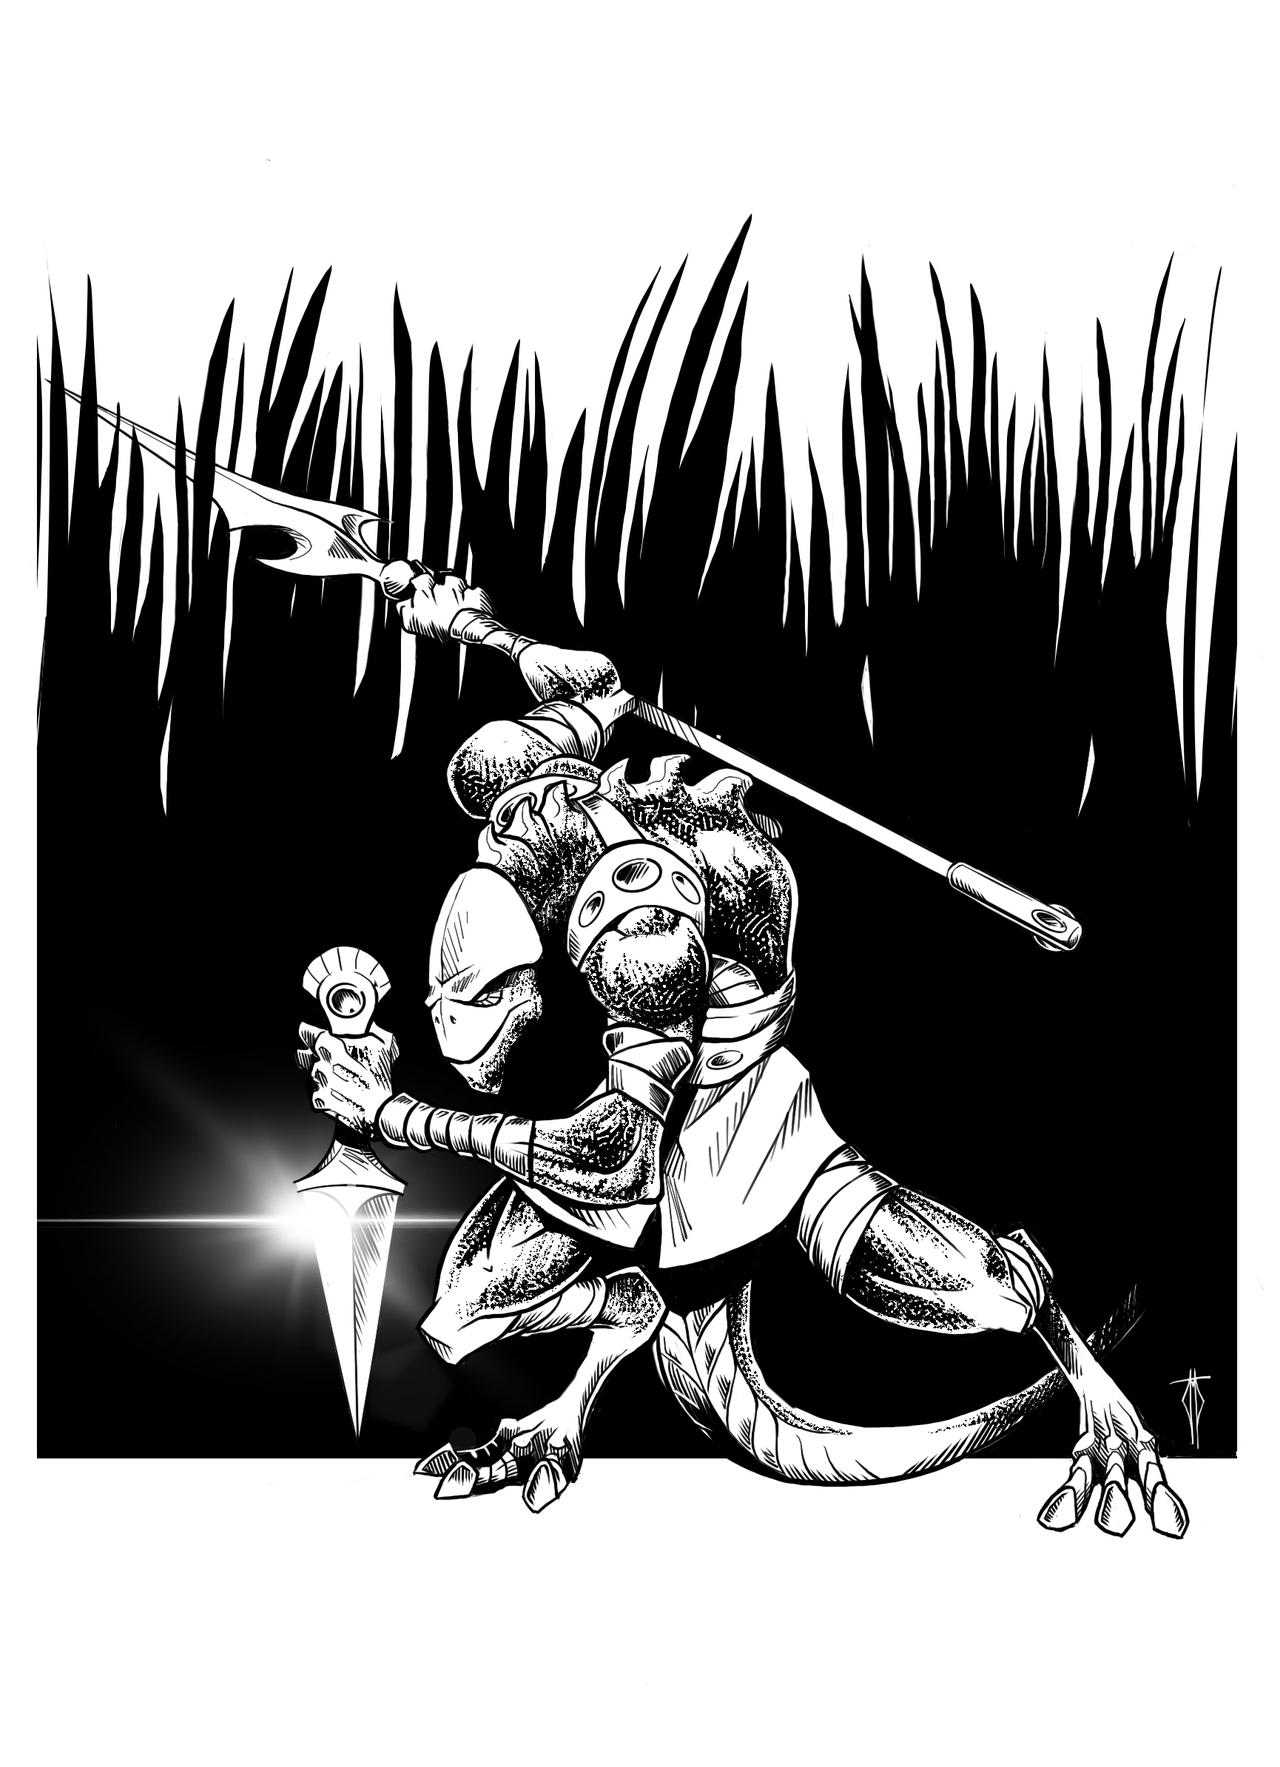 Agrabarian Lizardman